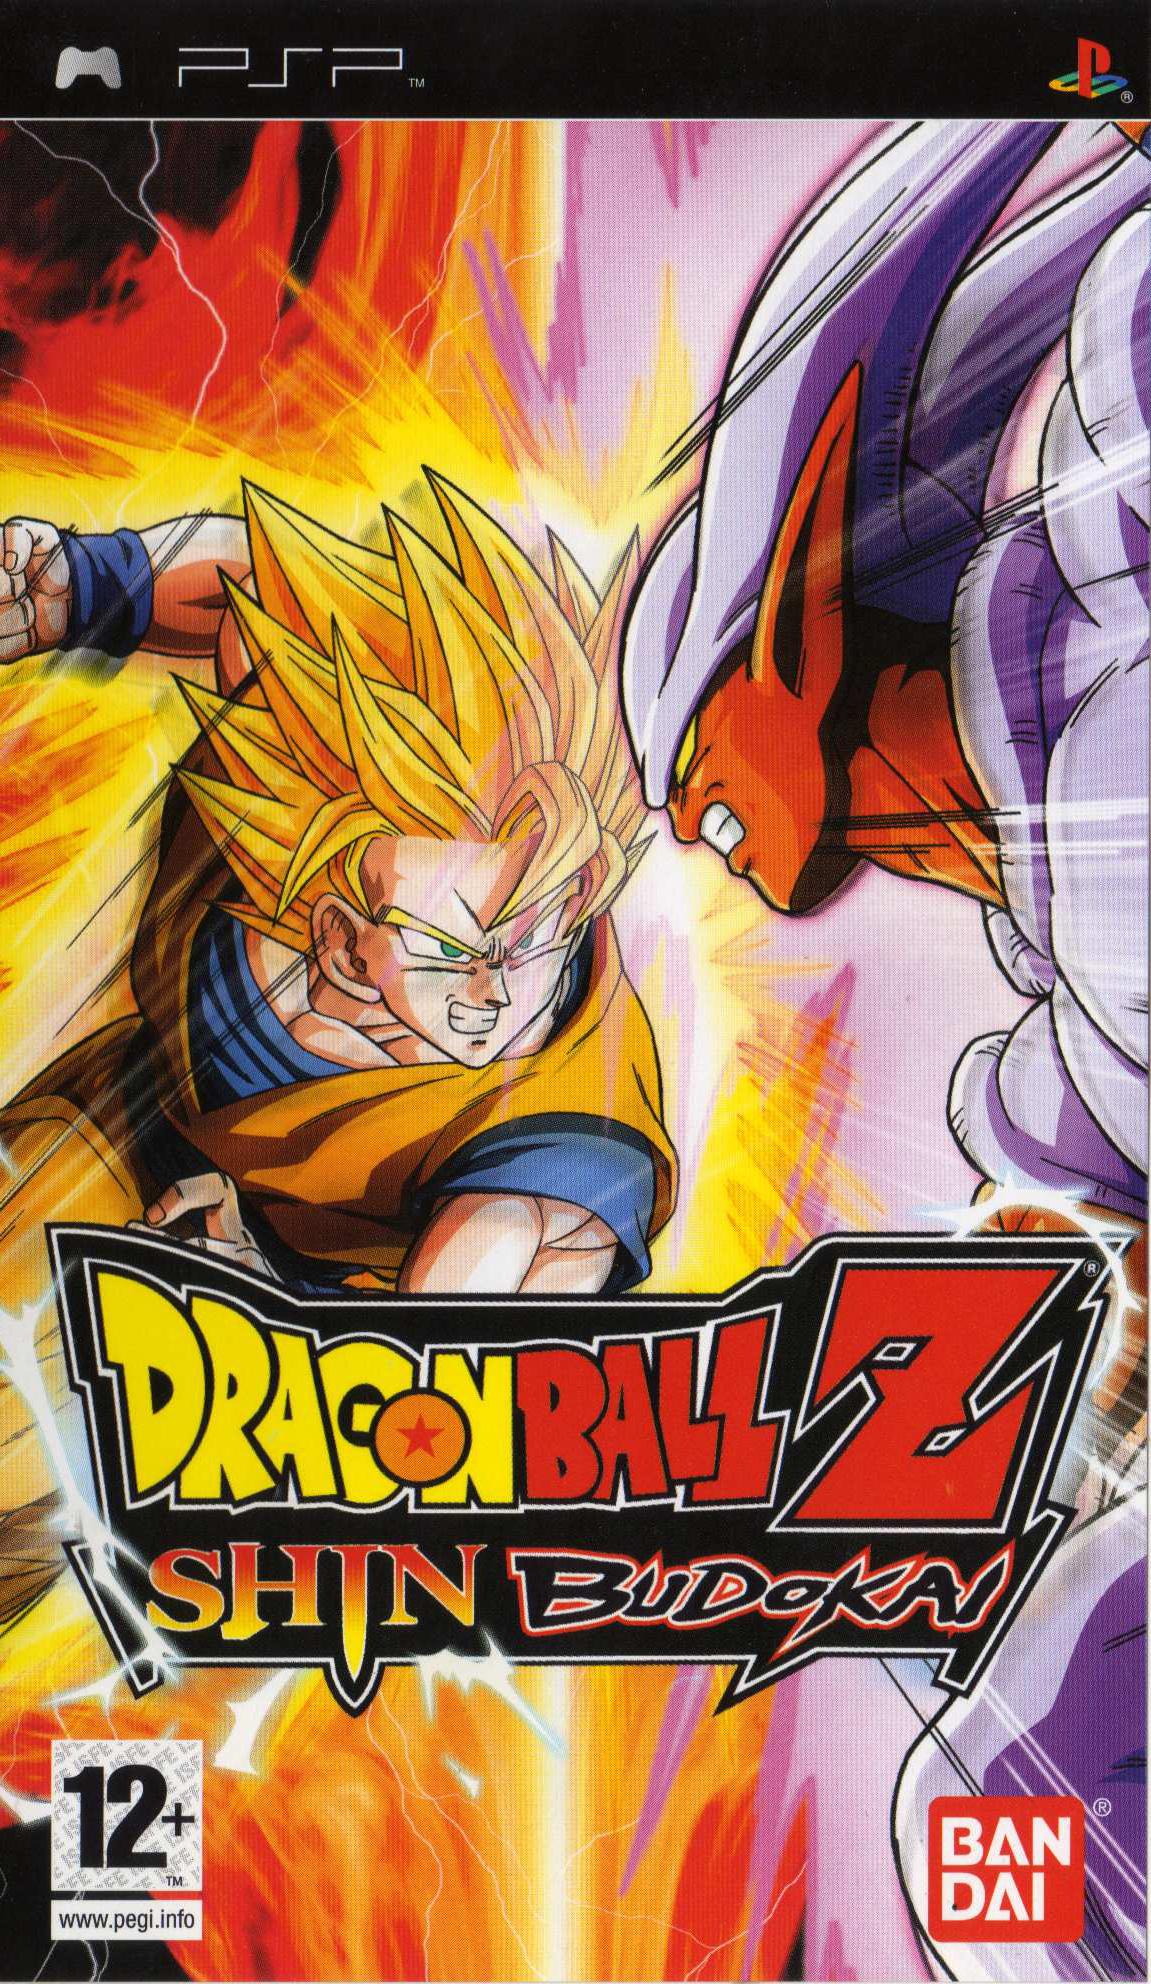 Dragon ball z shin budokai dragon ball wiki fandom - Dragon bale z ...